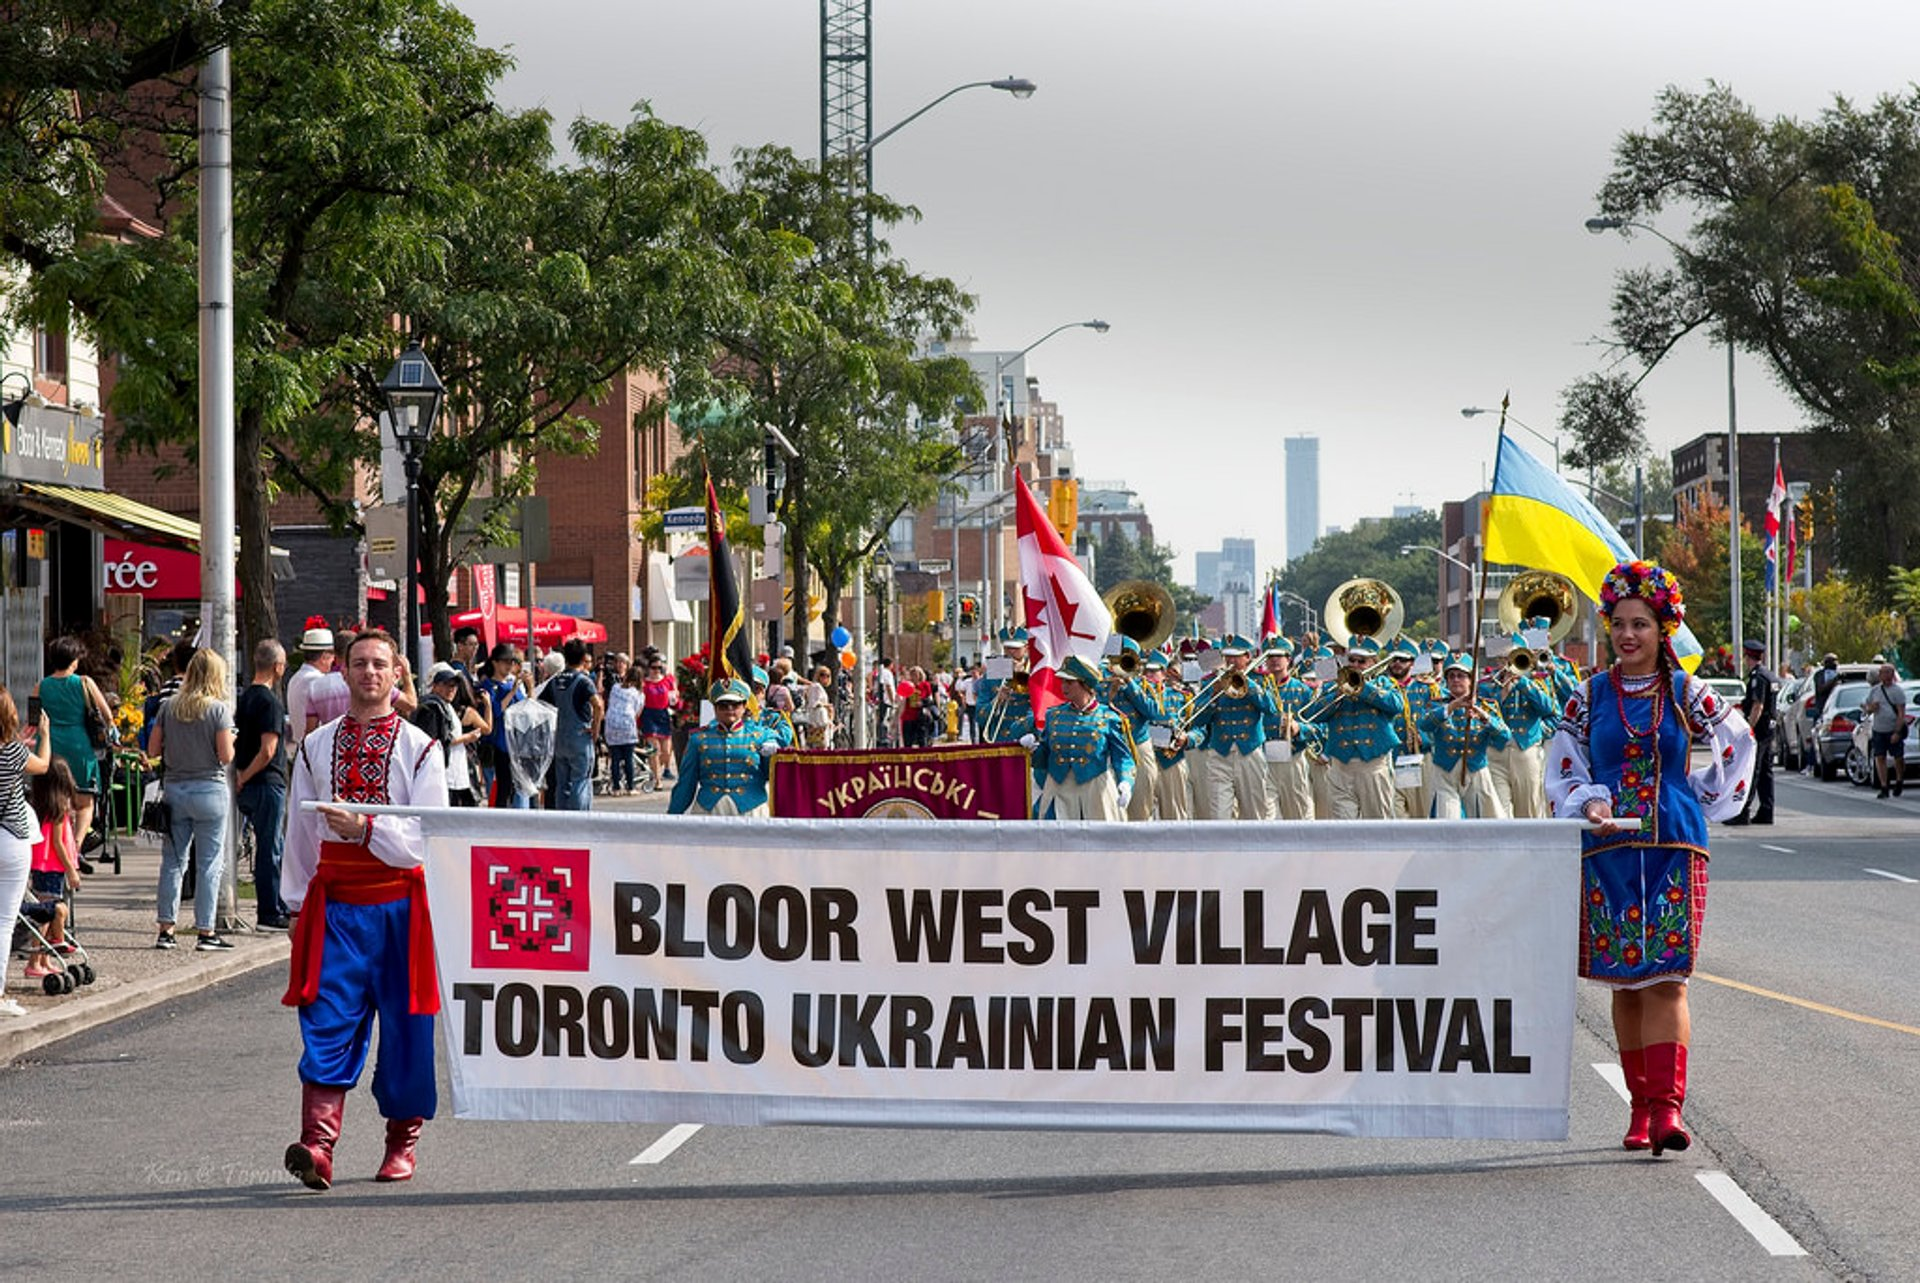 Toronto Ukrainian Festival in Toronto 2020 - Best Time